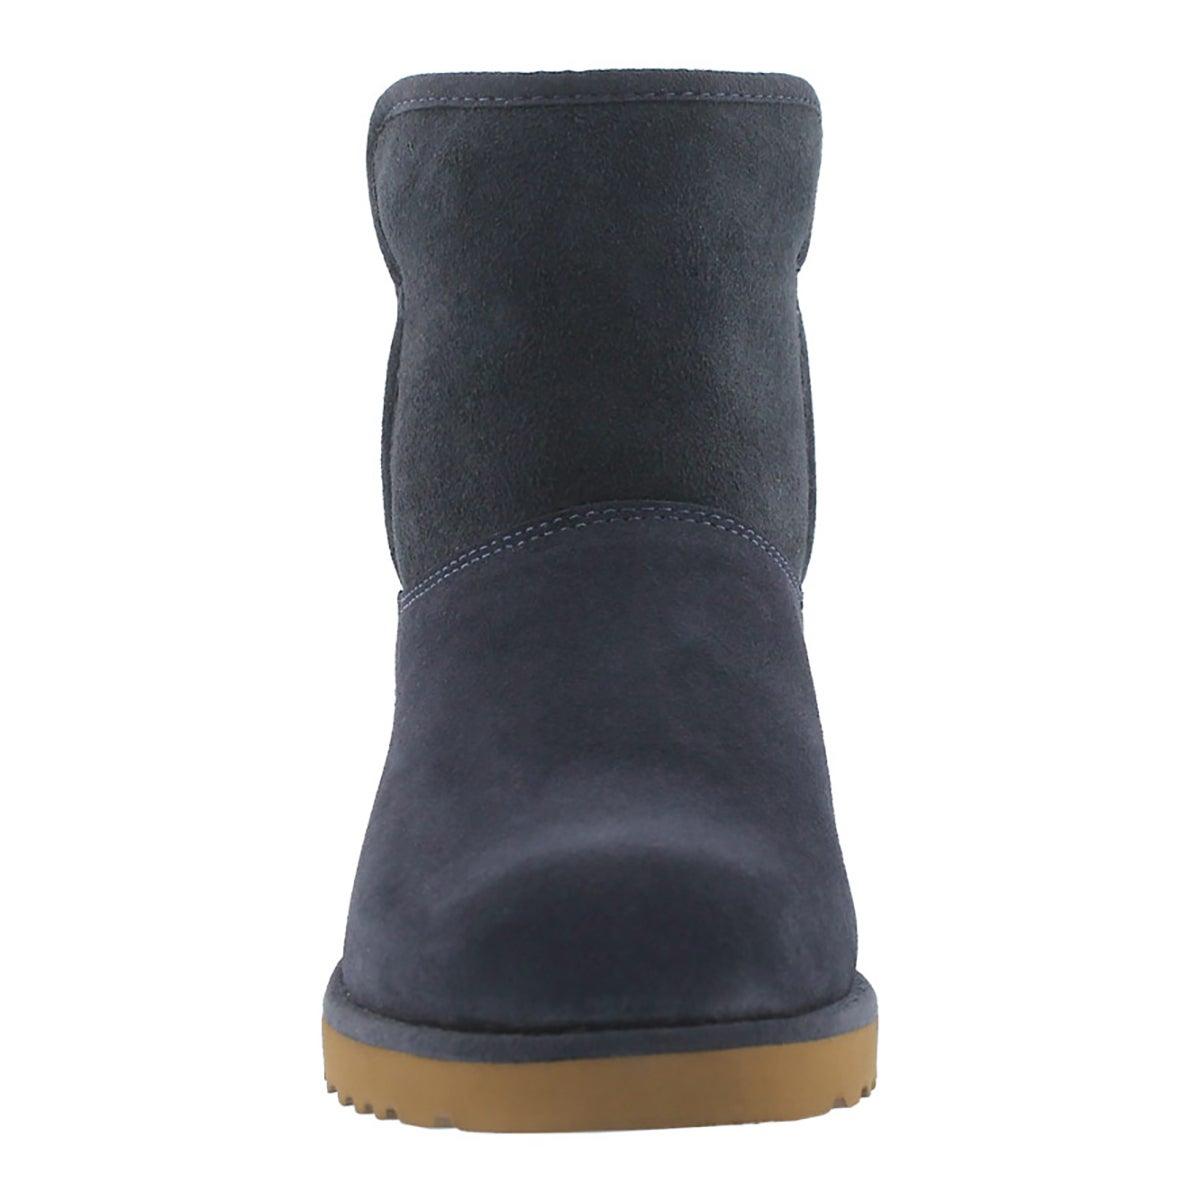 Lds Kristin navy wedge sheepskin boot